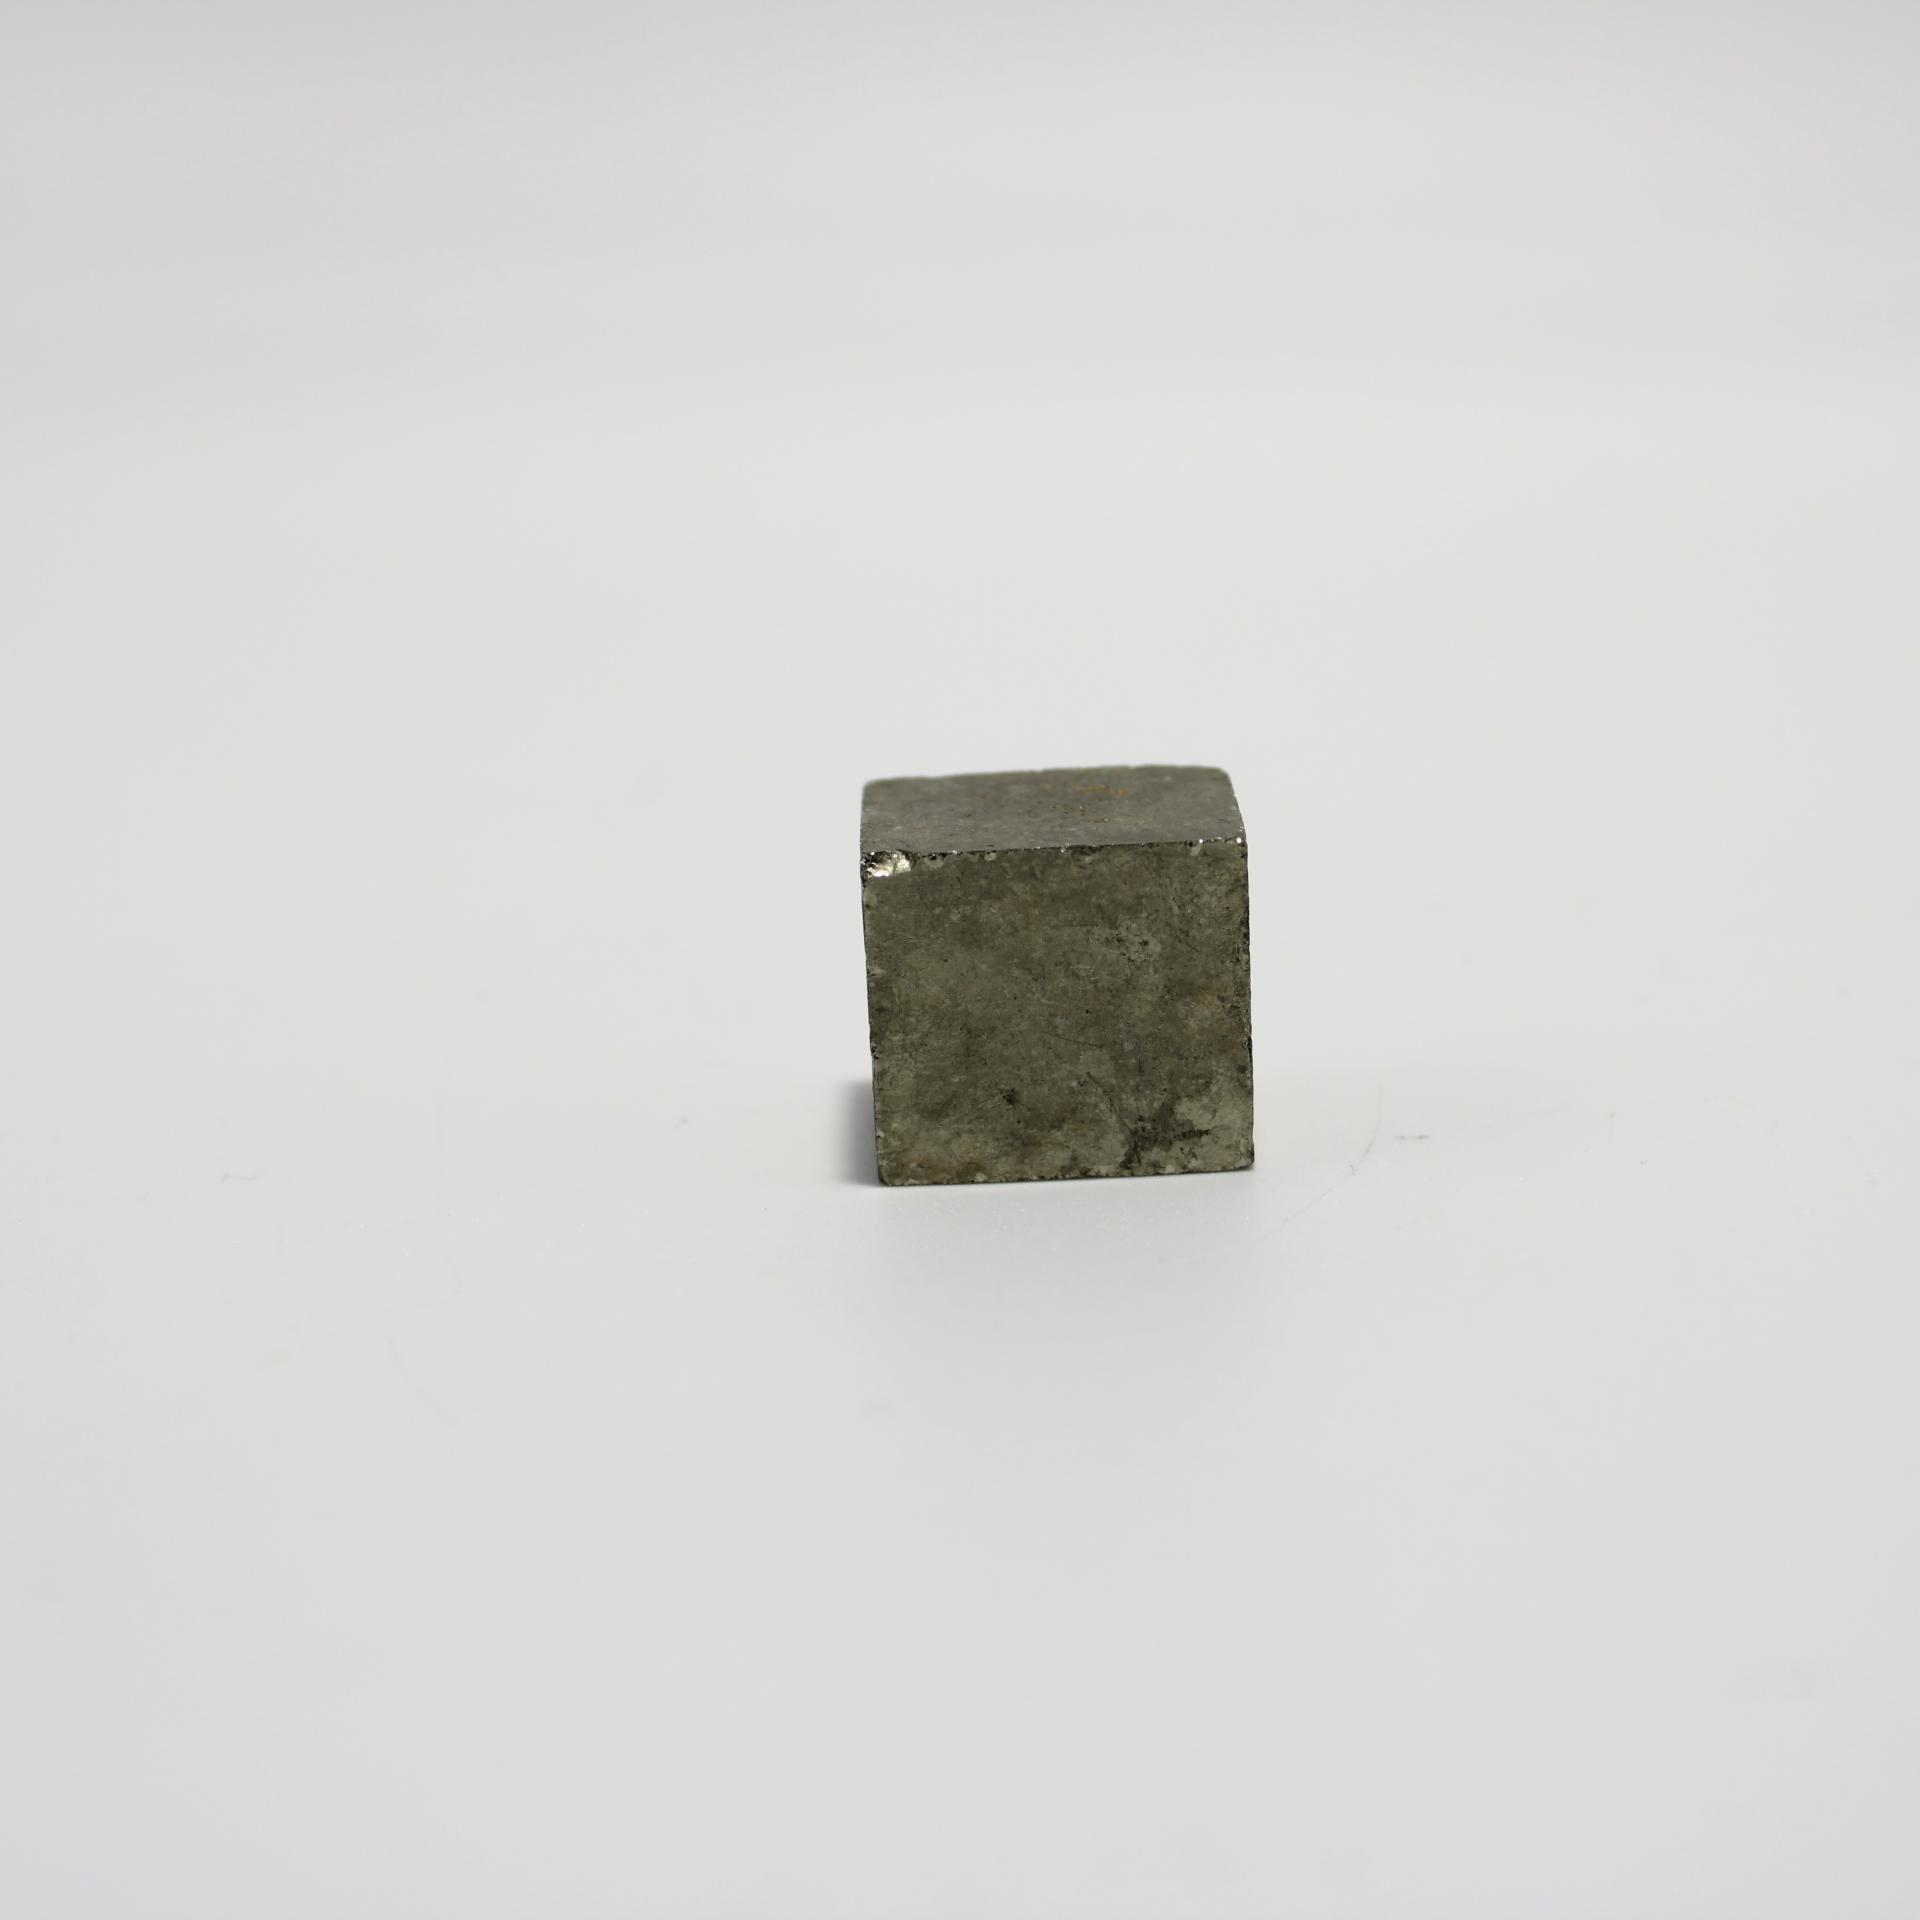 I77 pyritecube 1